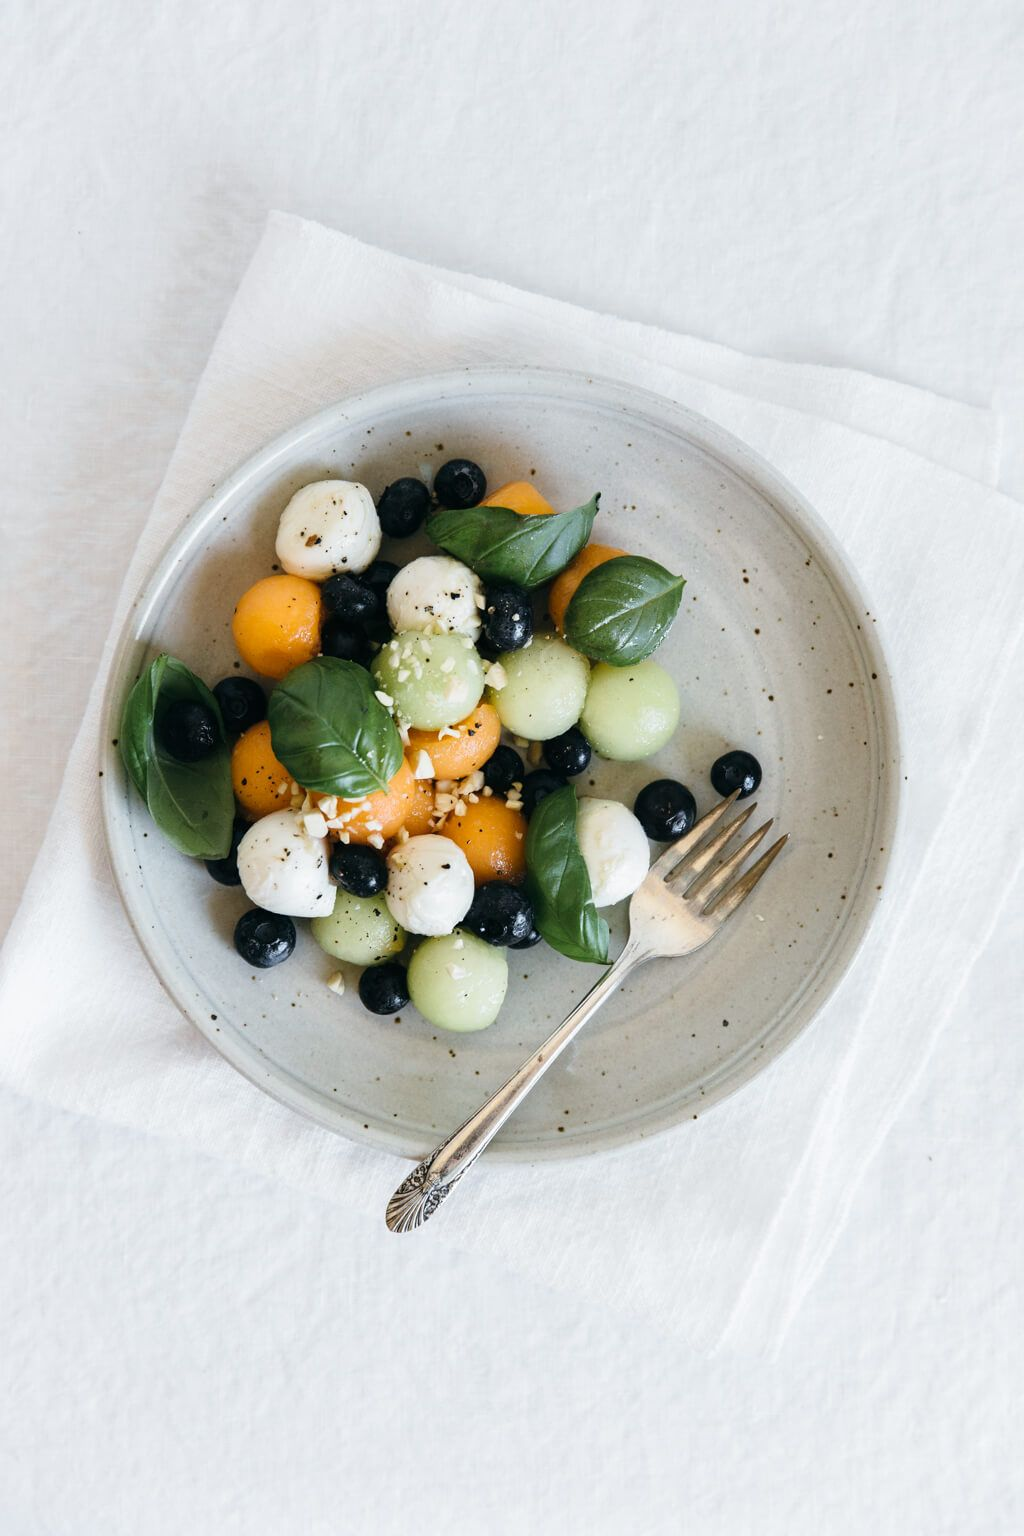 Melon Mozzarella Salad with Basil: